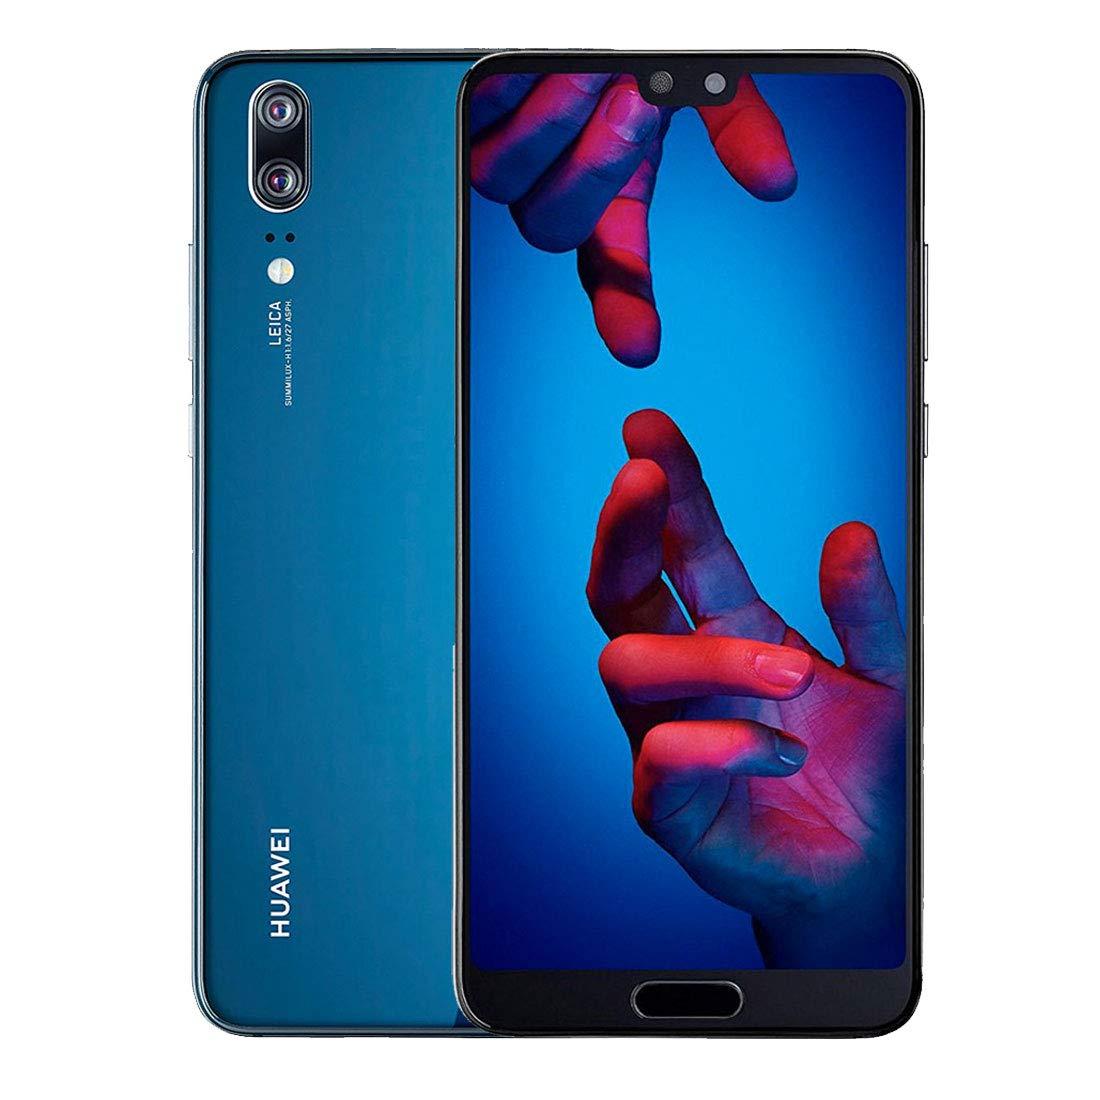 Huawei P20 - Smartphone de 5.8